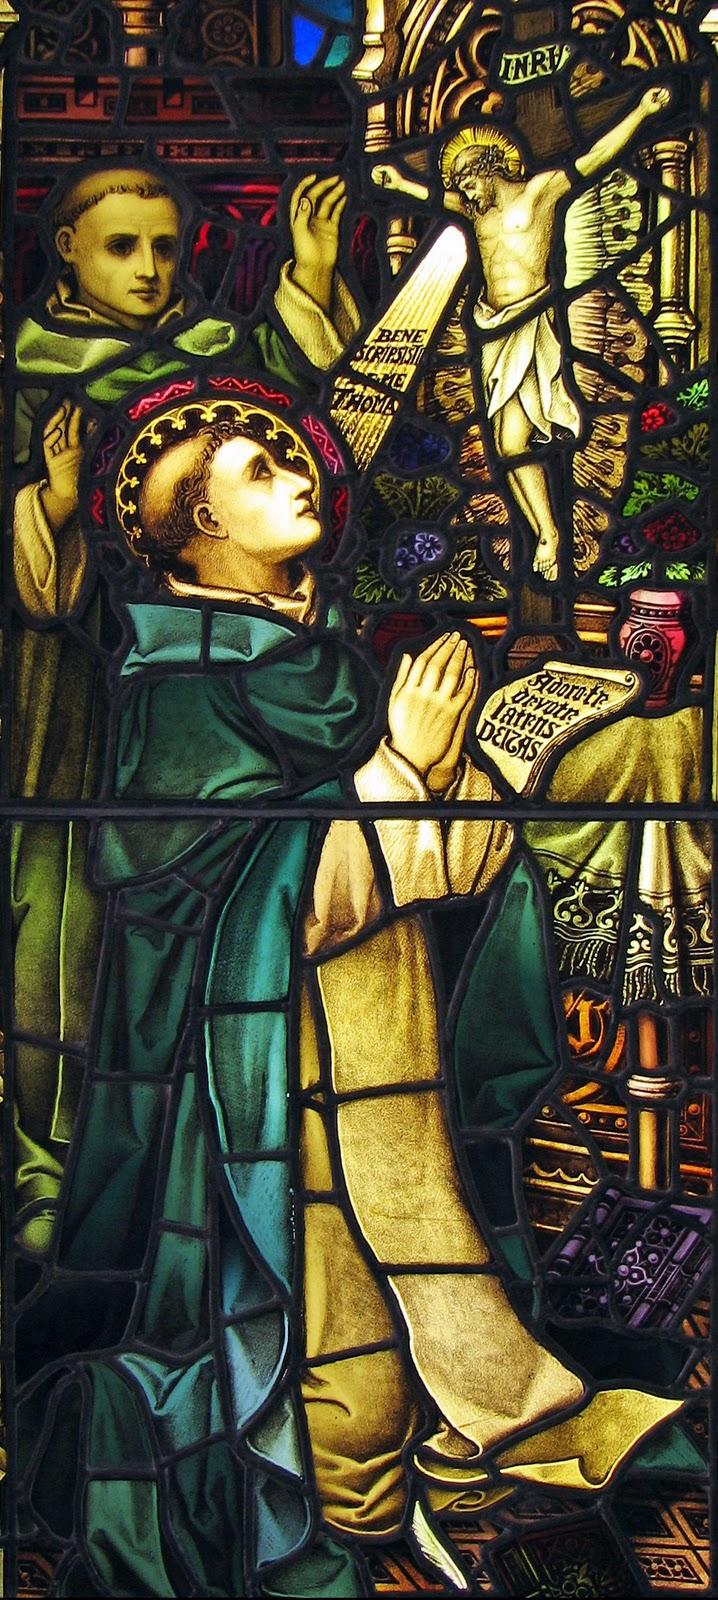 thomas aquinas Saint thomas aquinas op (/ ə ˈ k w aɪ n ə s / italian: tommaso d'aquino, lit thomas of aquino 1225 – 7 march 1274) was an italian dominican friar, catholic priest, and doctor of the church.